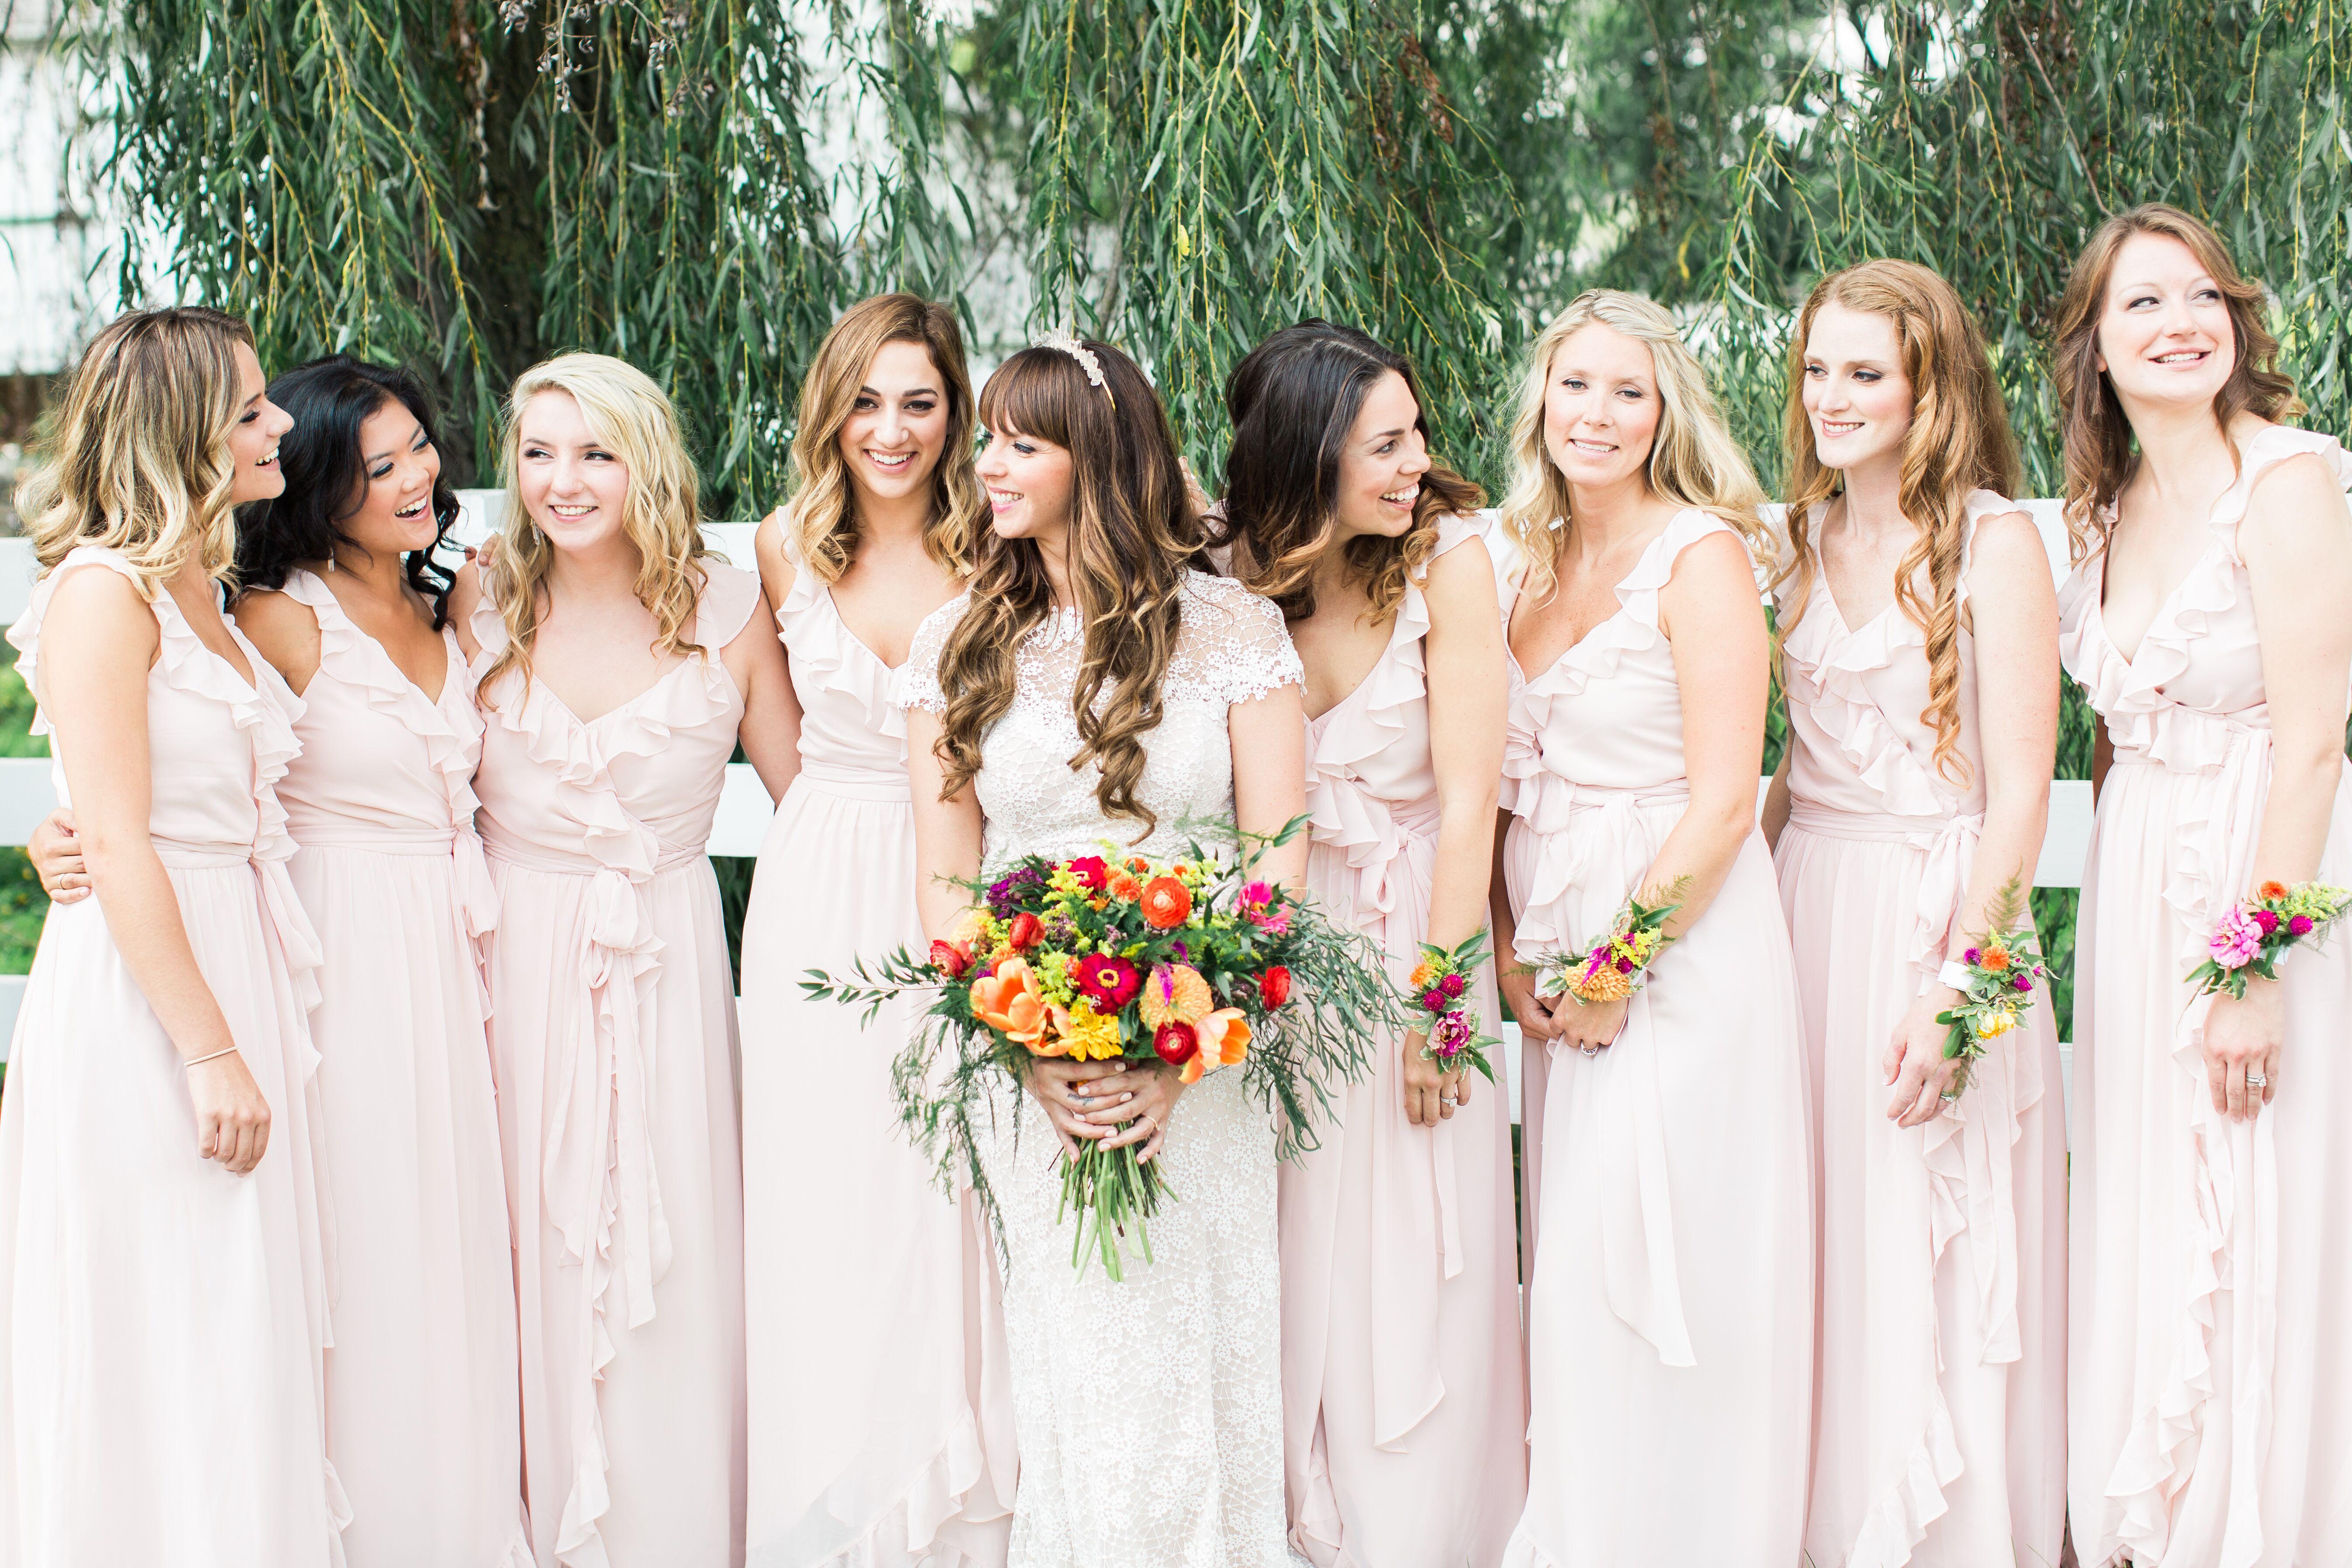 Bohemian bridesmaid dresses joanna august polly blush bridesmaid dress ombrellifo Image collections